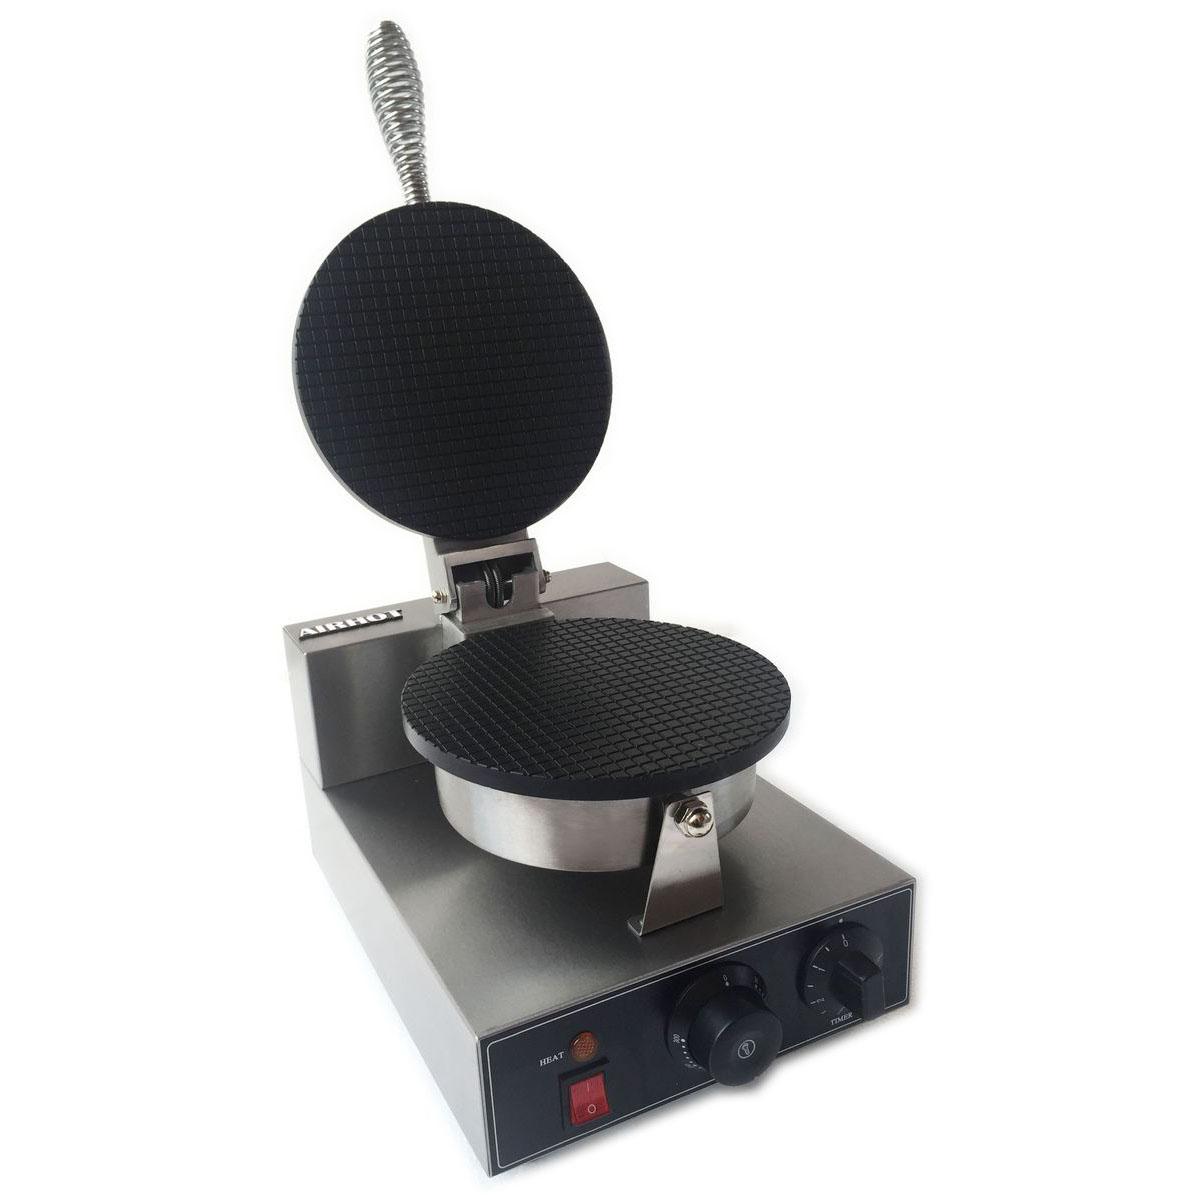 Вафельница для тонкой вафли на рожок Airhot WE-1S